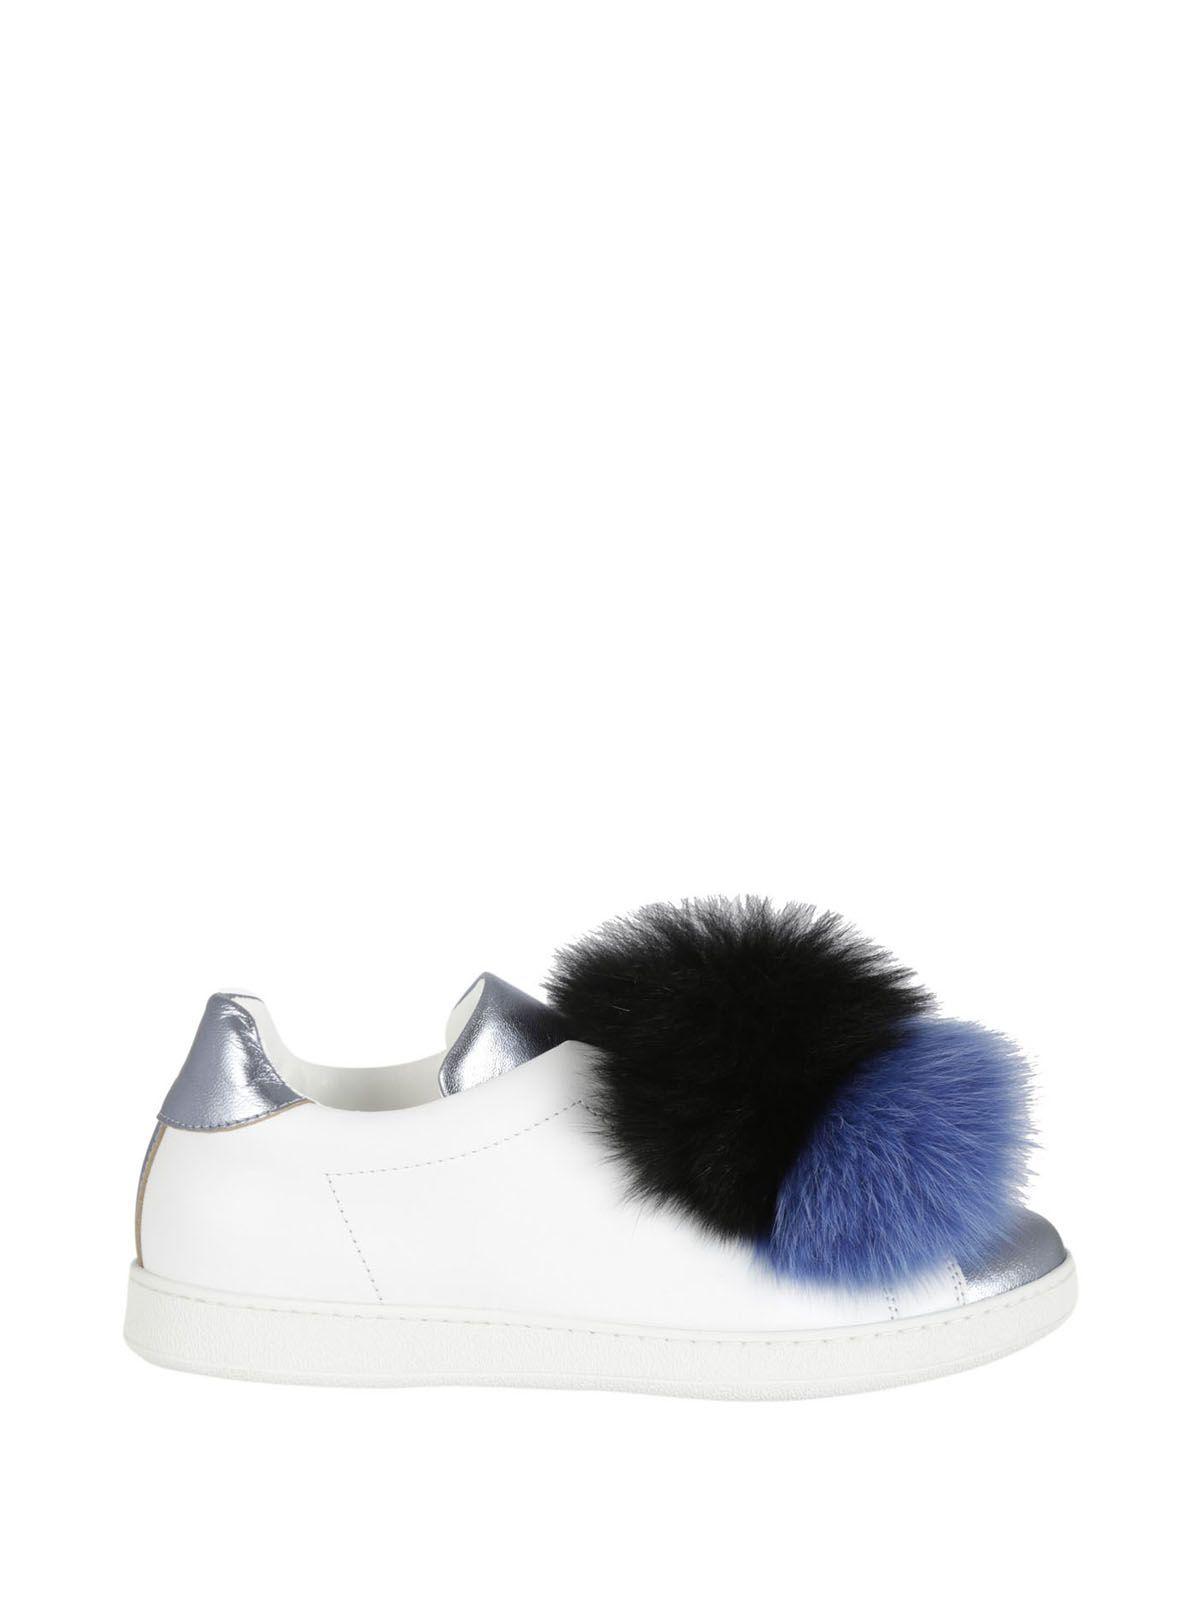 many kinds of online find great for sale Joshua Sanders Pom-Pom Slip-On Sneakers cL9KA